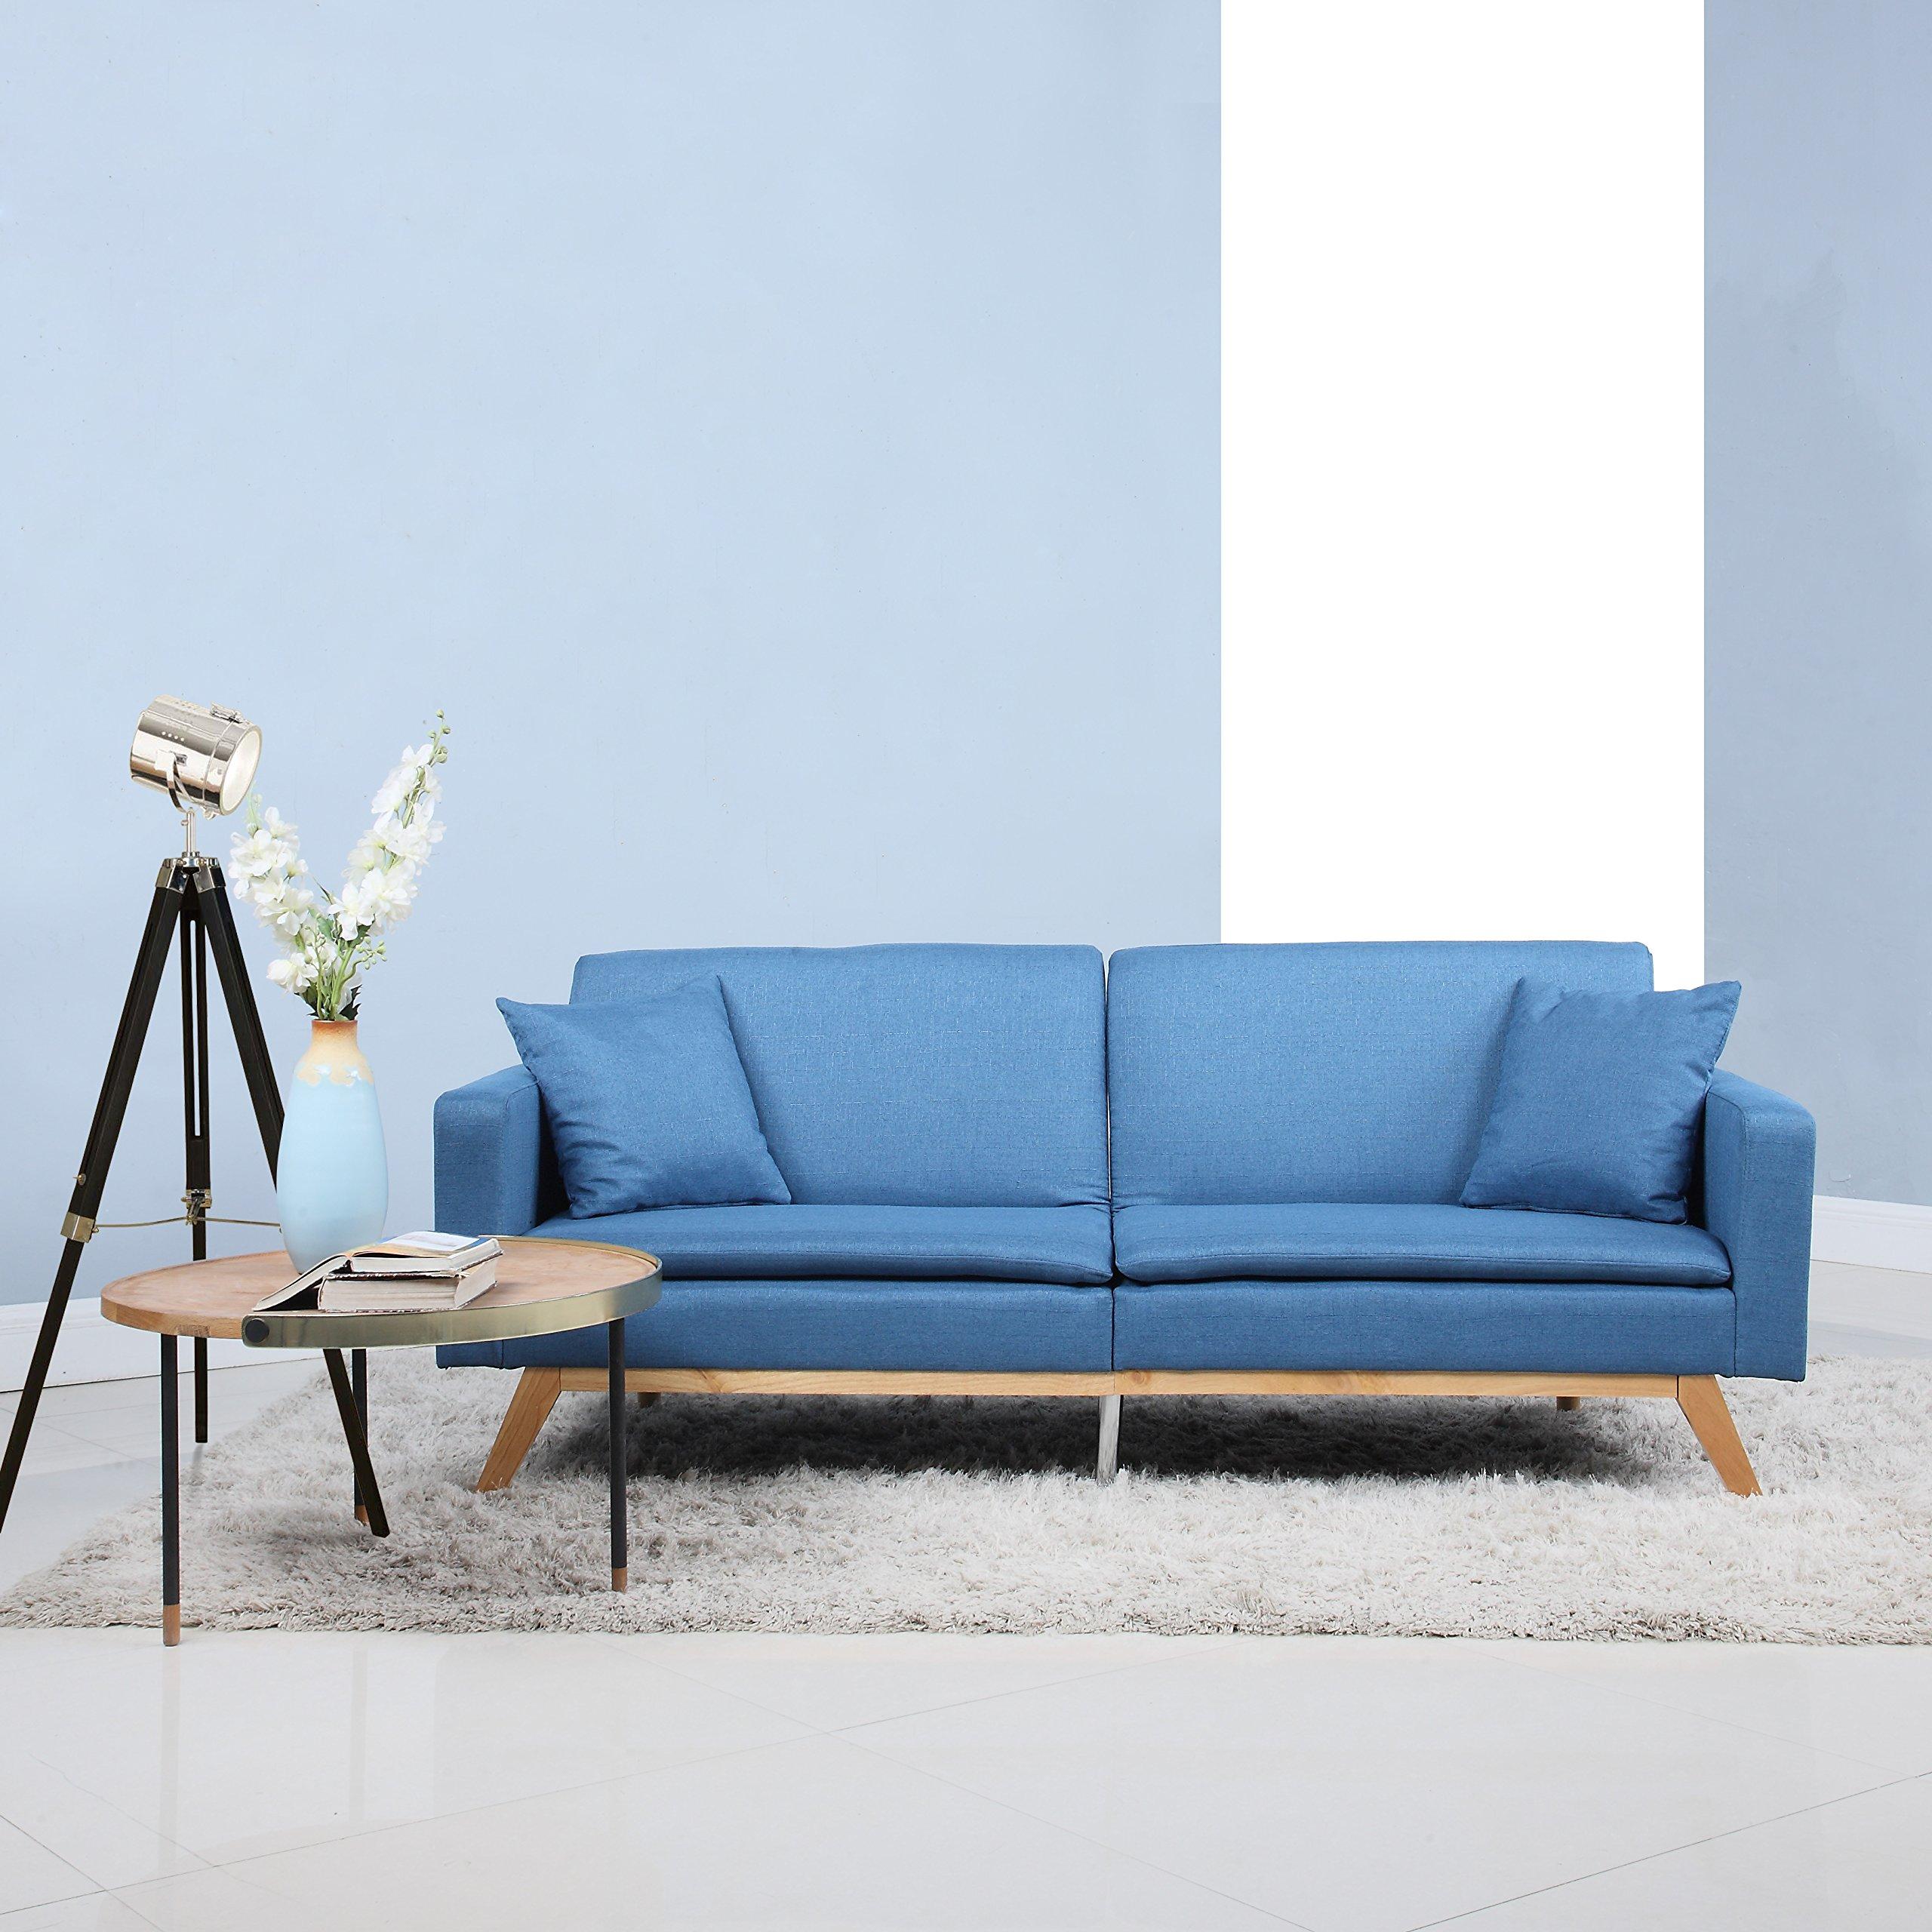 Divano Roma Furniture Modern Tufted Linen Splitback Recliner Sleeper Futon Sofa (Blue) by DIVANO ROMA FURNITURE